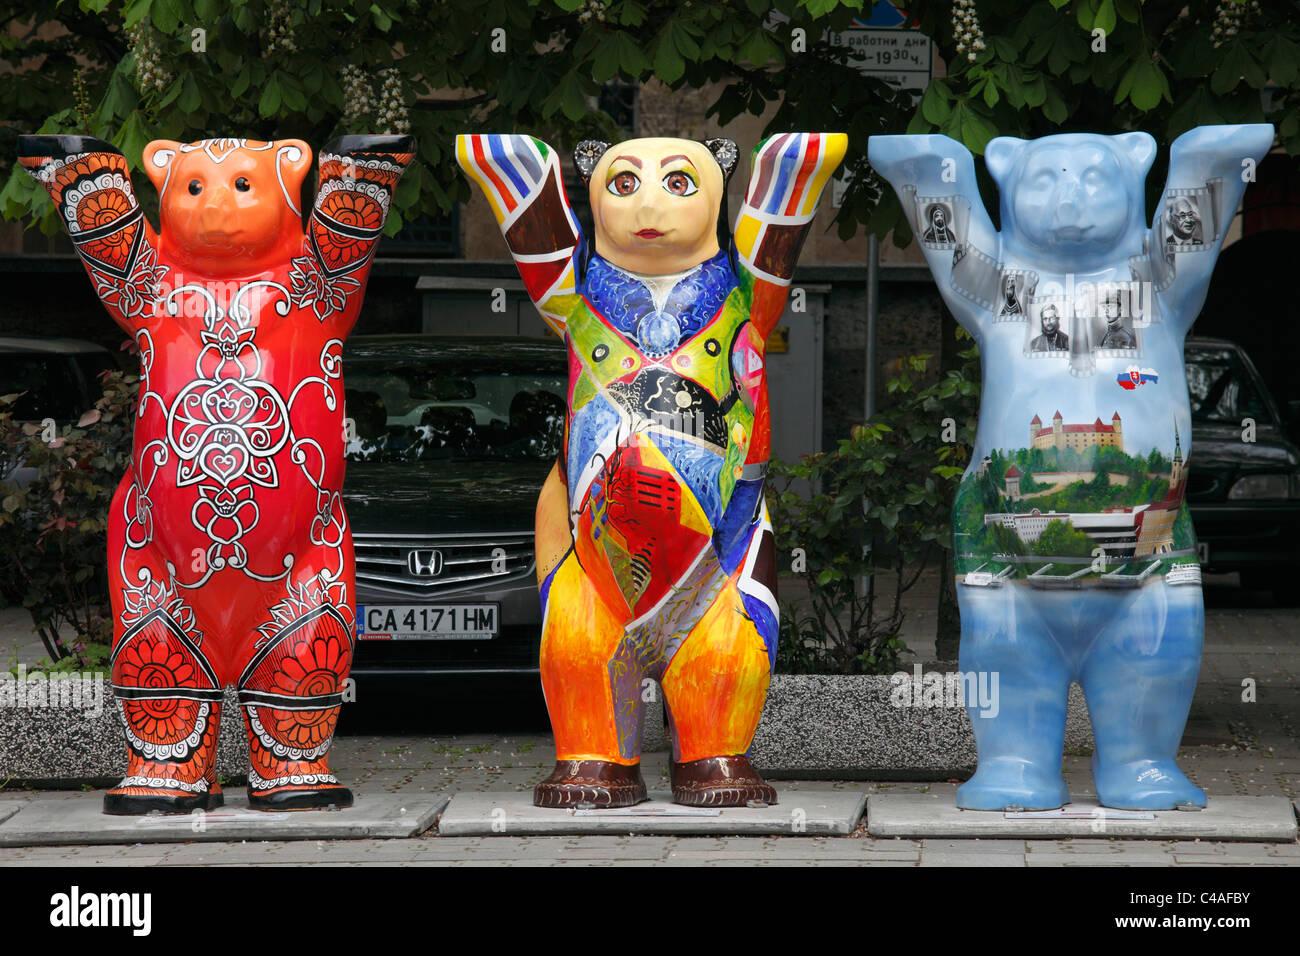 Bulgaria, Sofia, United Buddy Bears Exhibition, - Stock Image